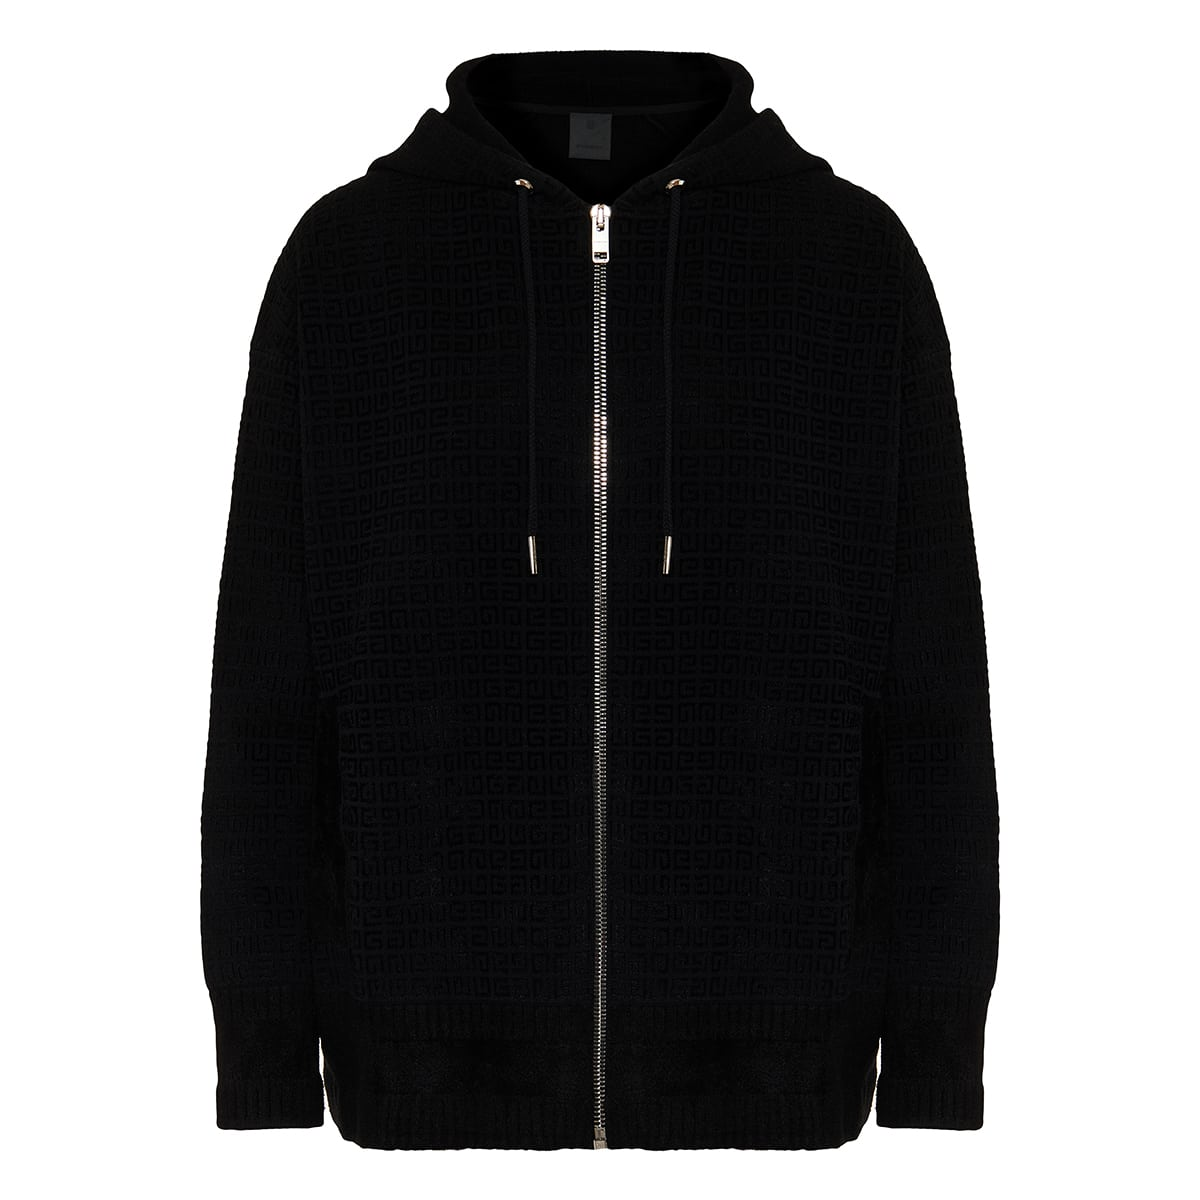 4G knitted zipper hoodie